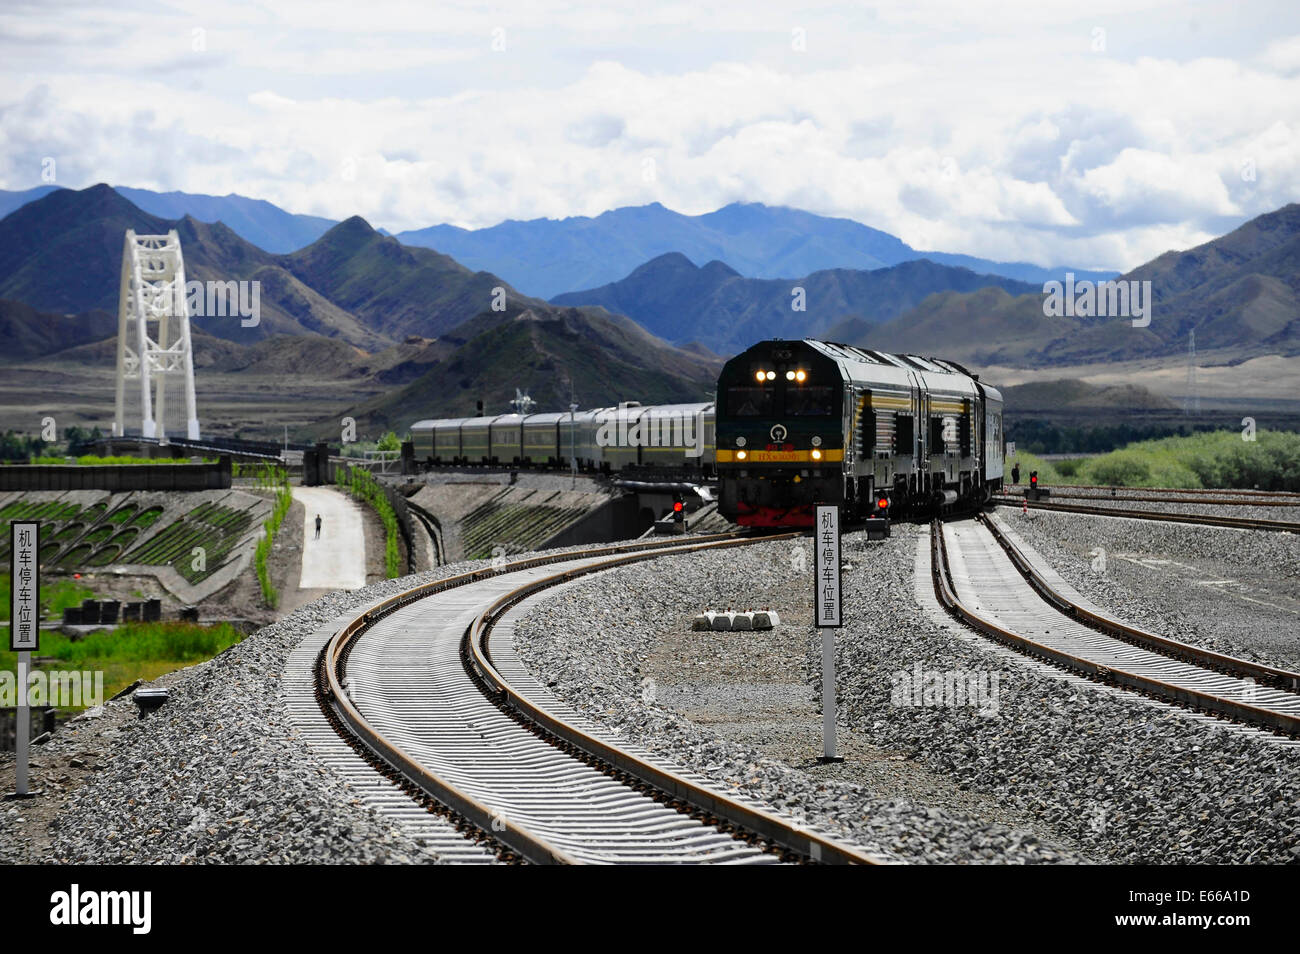 Xigaze, China's Tibet Autonomous Region. 16th Aug, 2014. The first passenger train from Lhasa to Xigaze heads - Stock Image